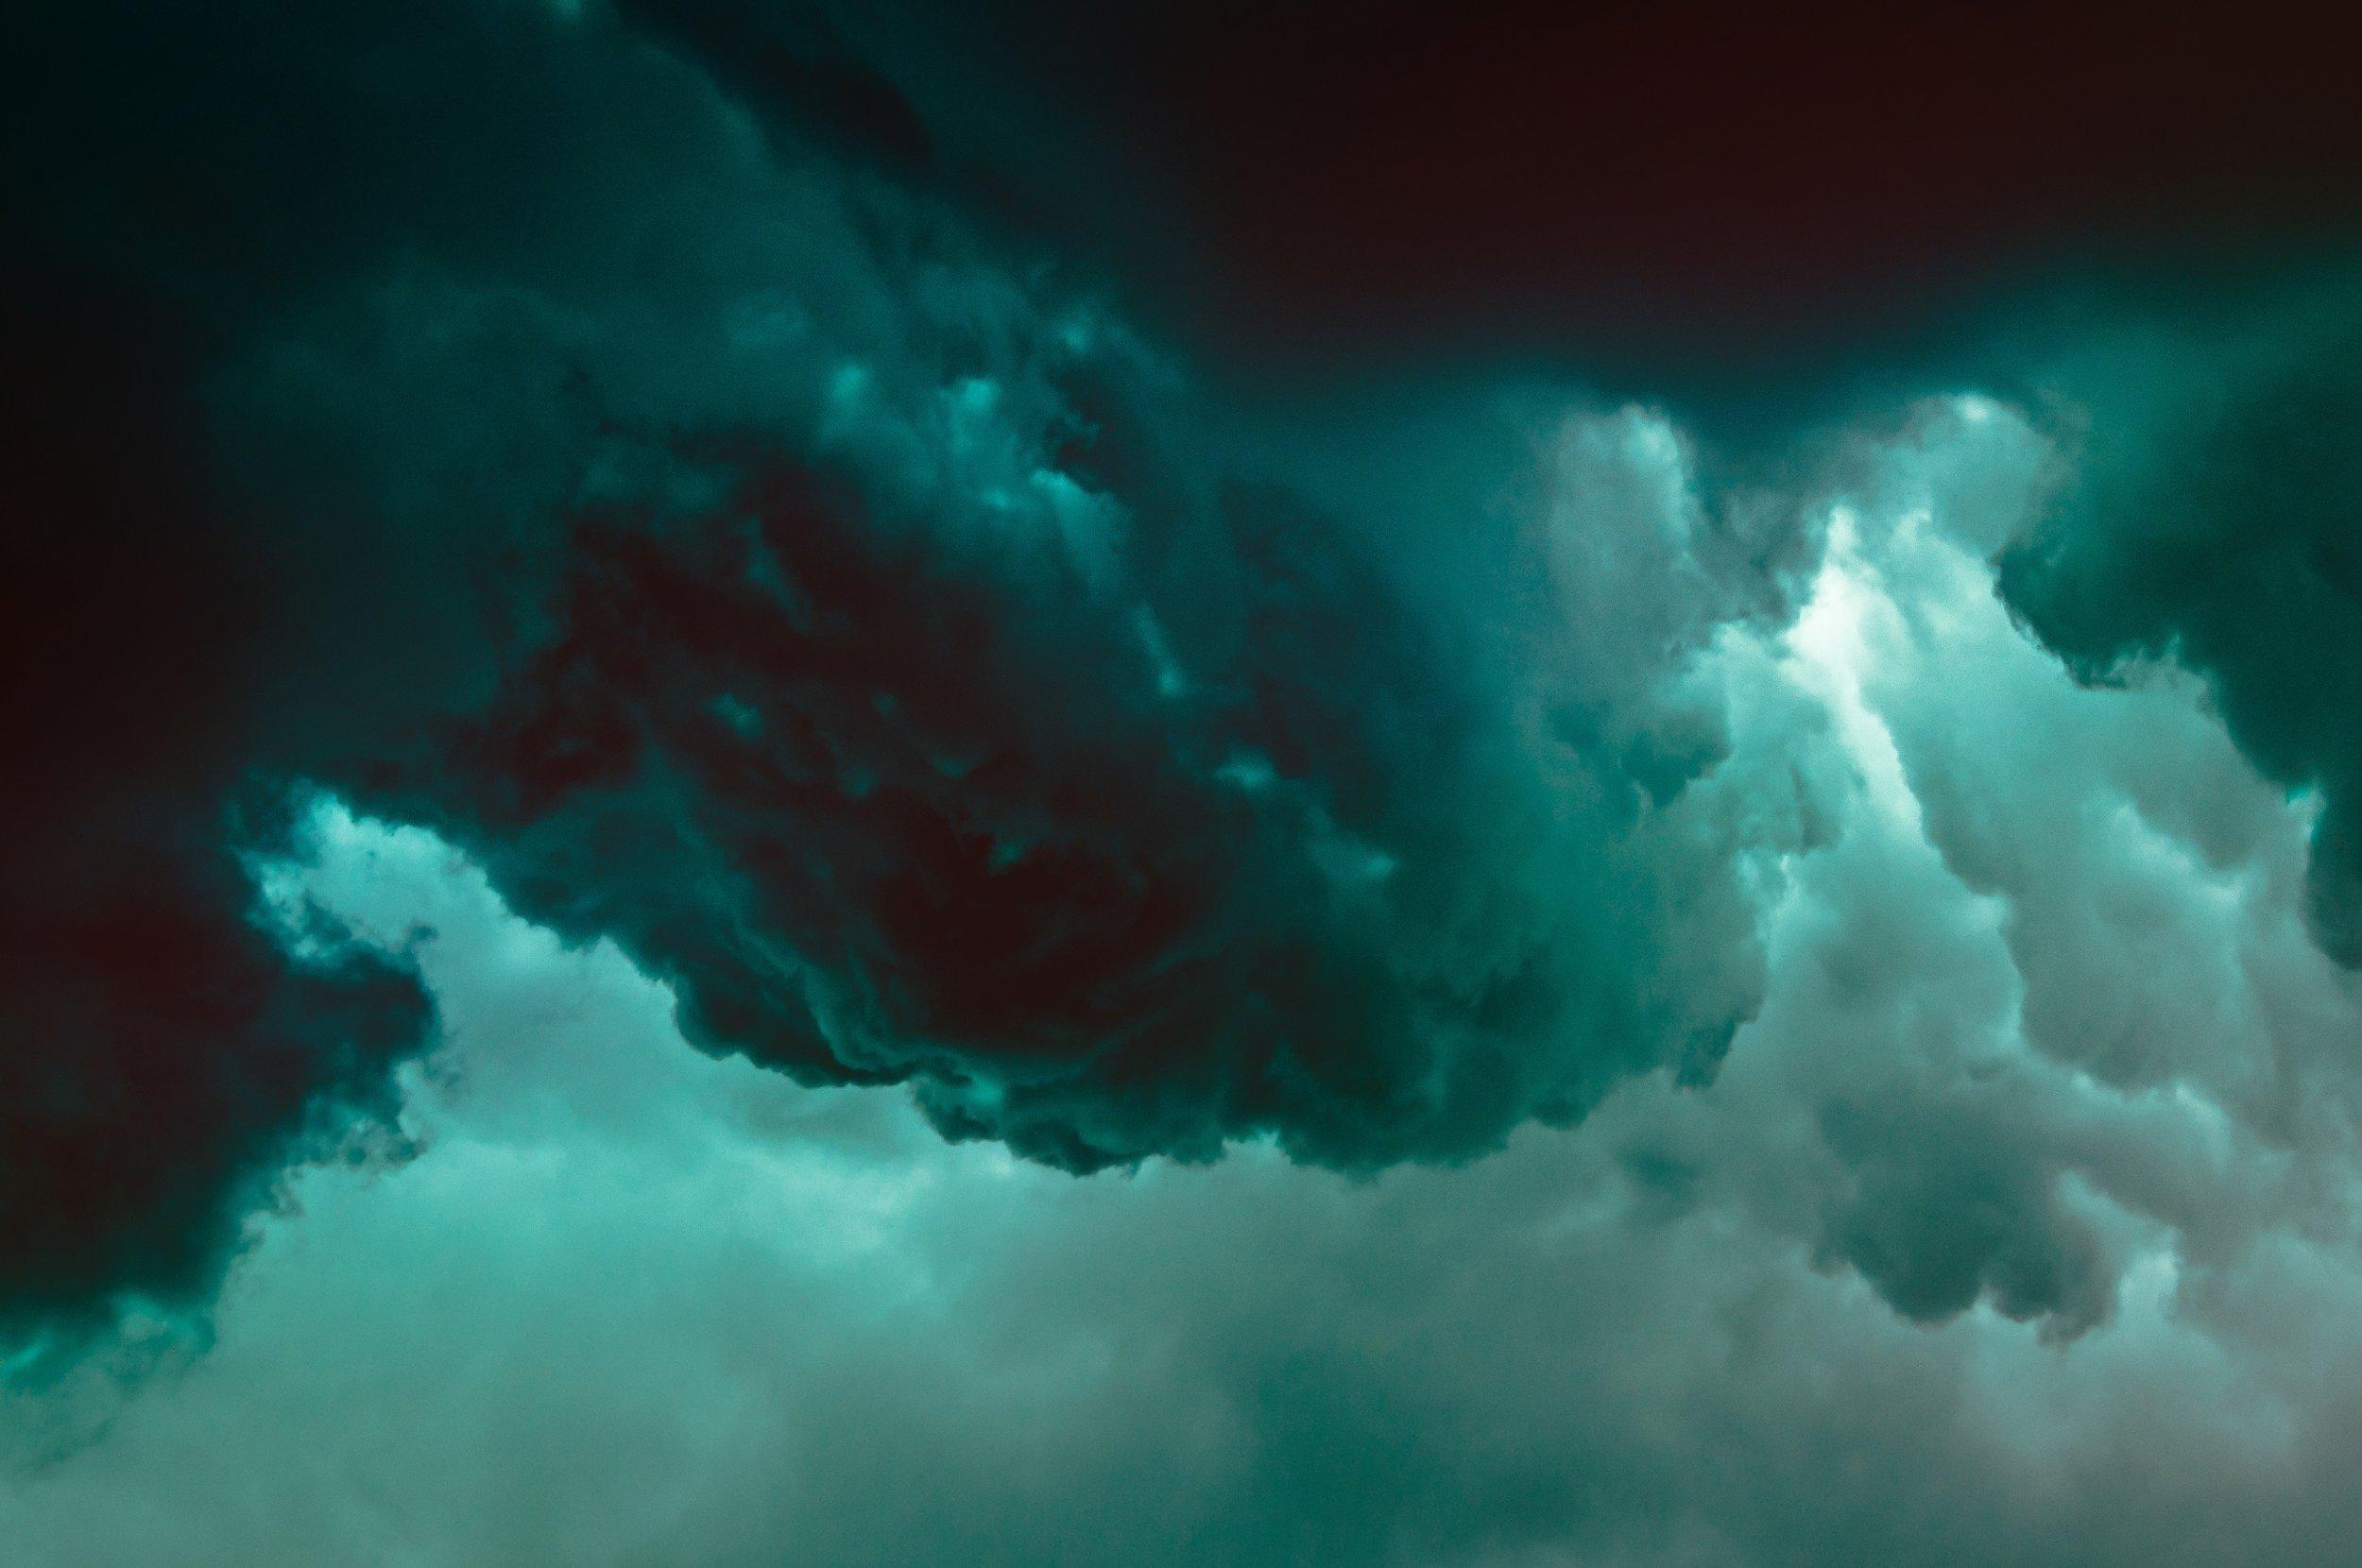 jaw-brew-green-brewing-clouds.jpg